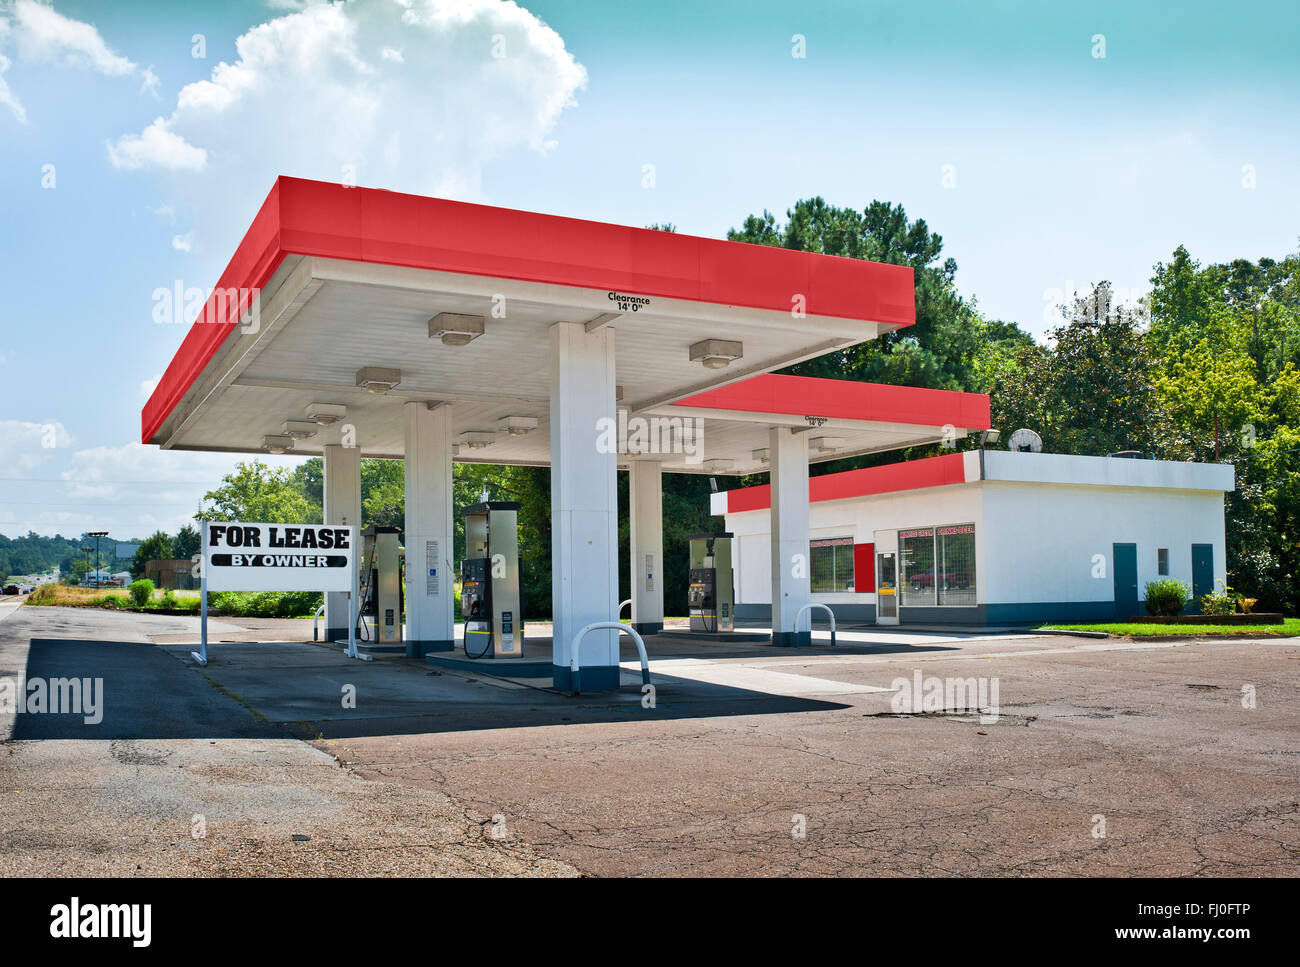 Bankrupt Gasoline Station Convenience Store - Stock Image